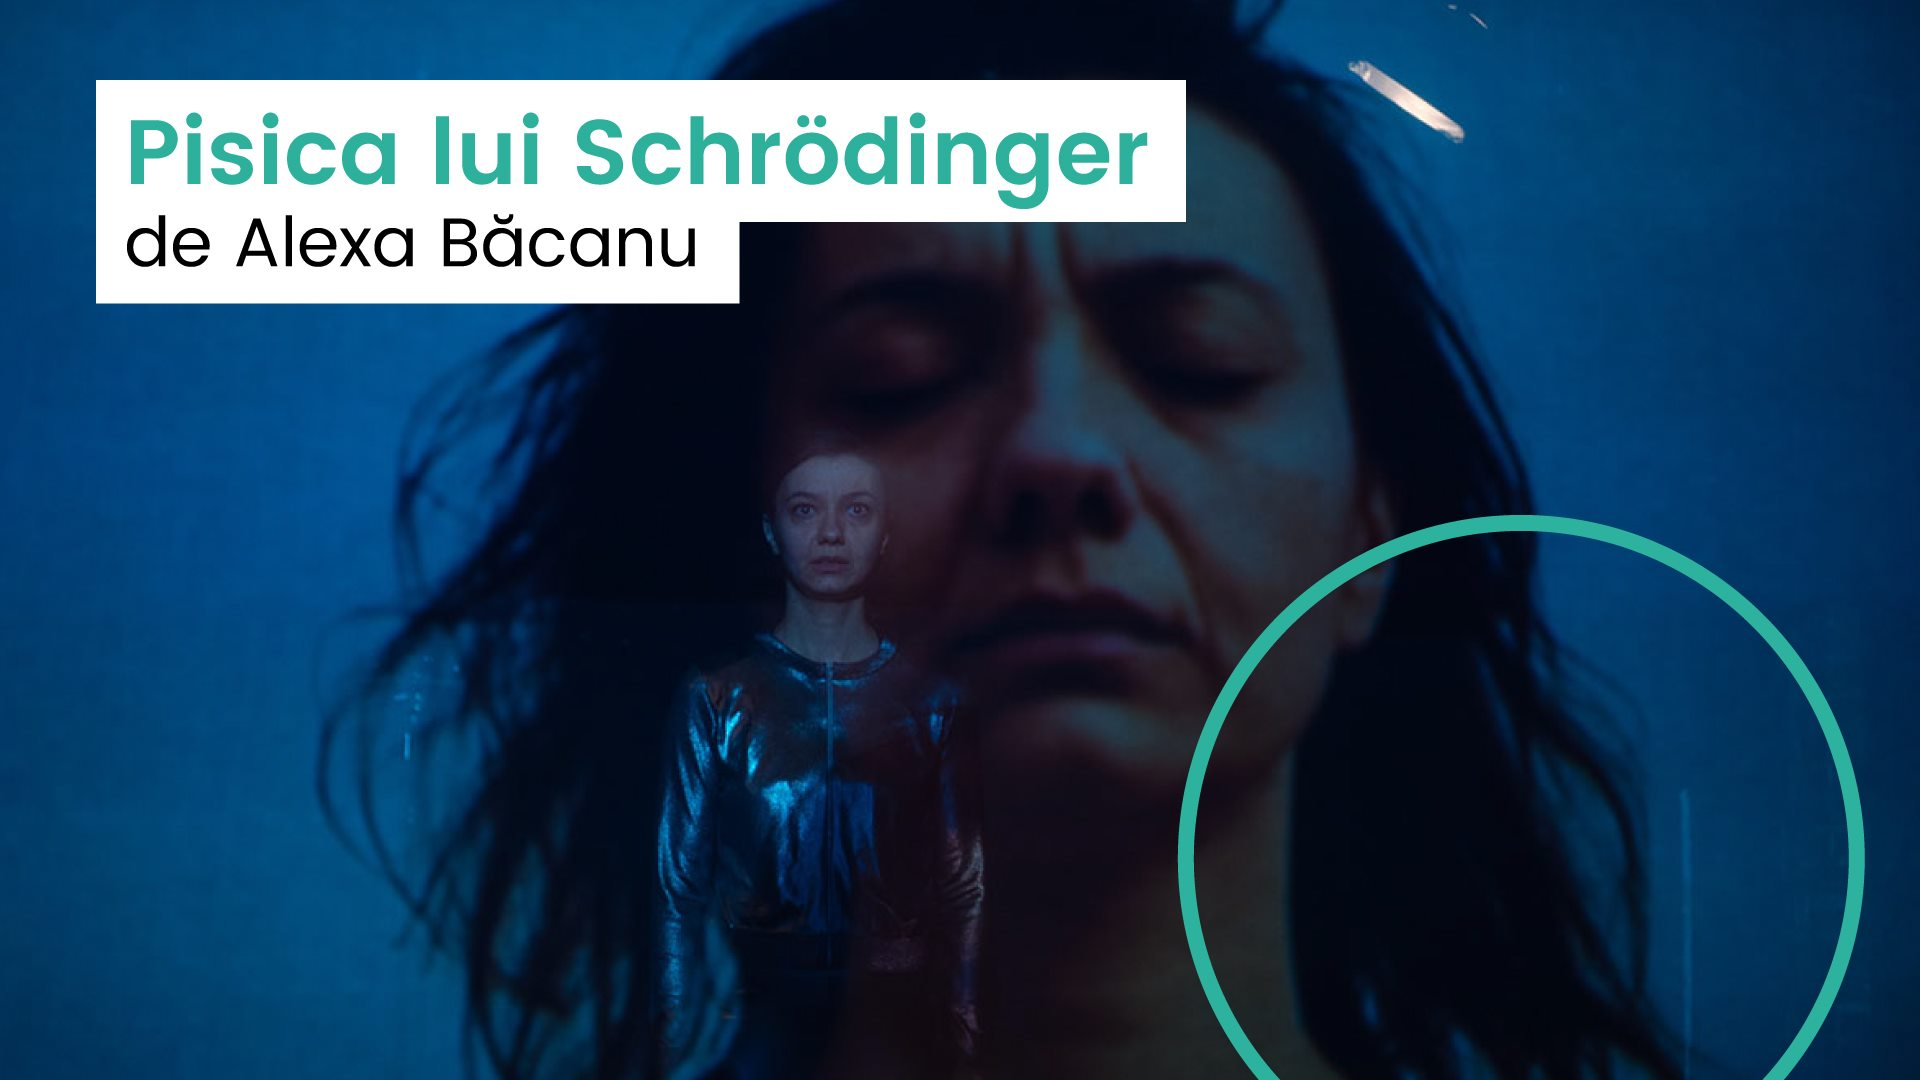 Pisica lui Schrödinger | FDP10